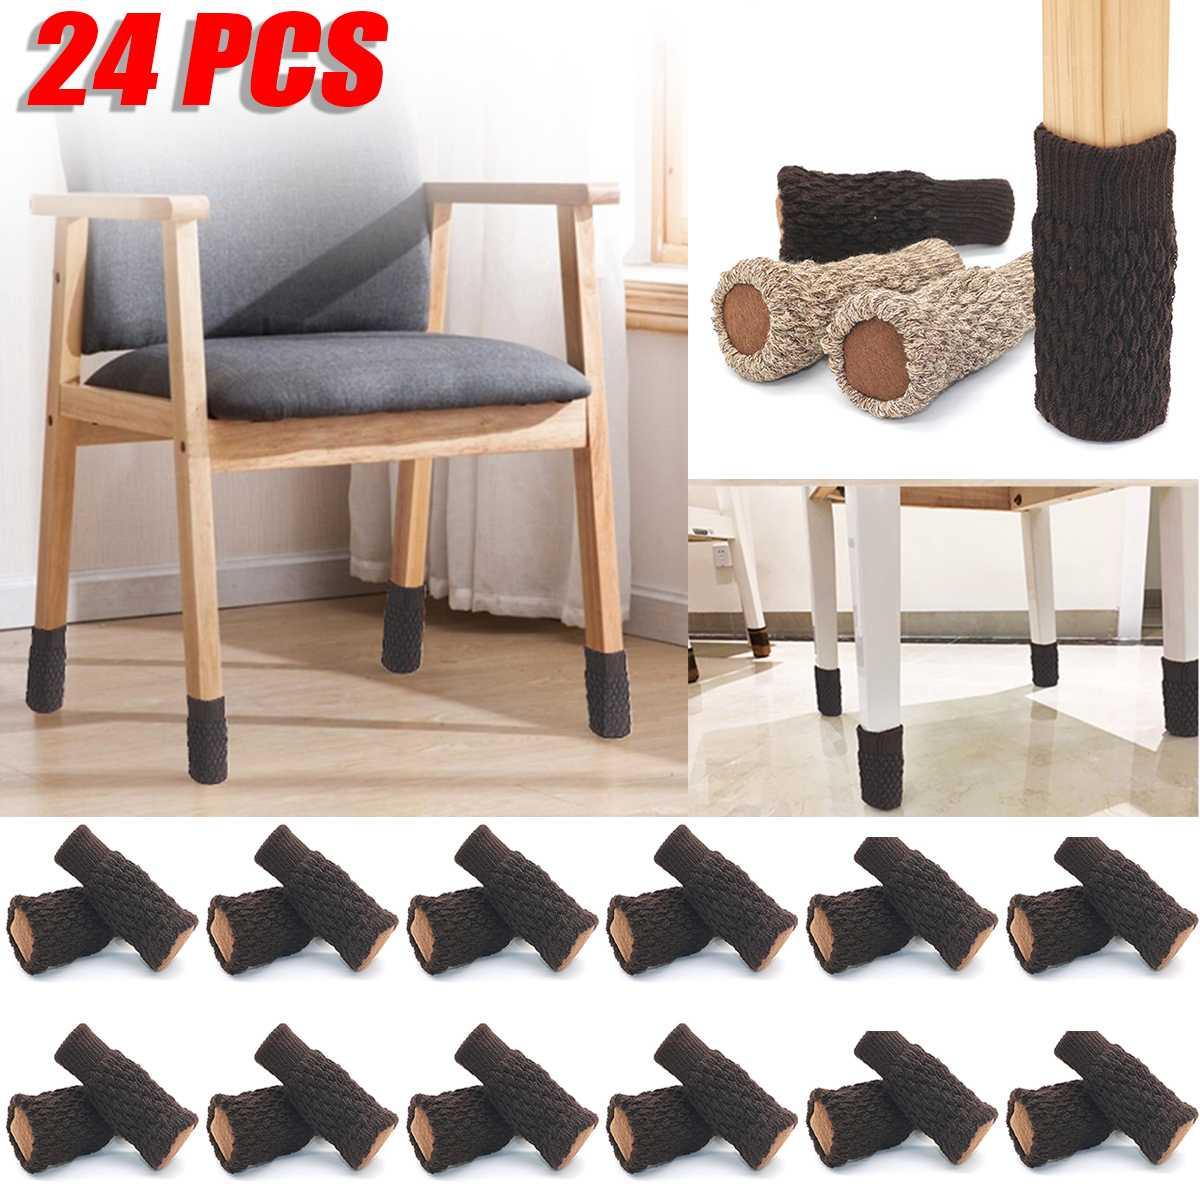 24PCS Table Furniture Feet Sleeve Cover Protectors Chair Leg Socks Cloth Gloves Floor Protection Knitting Wool Socks Anti-slip